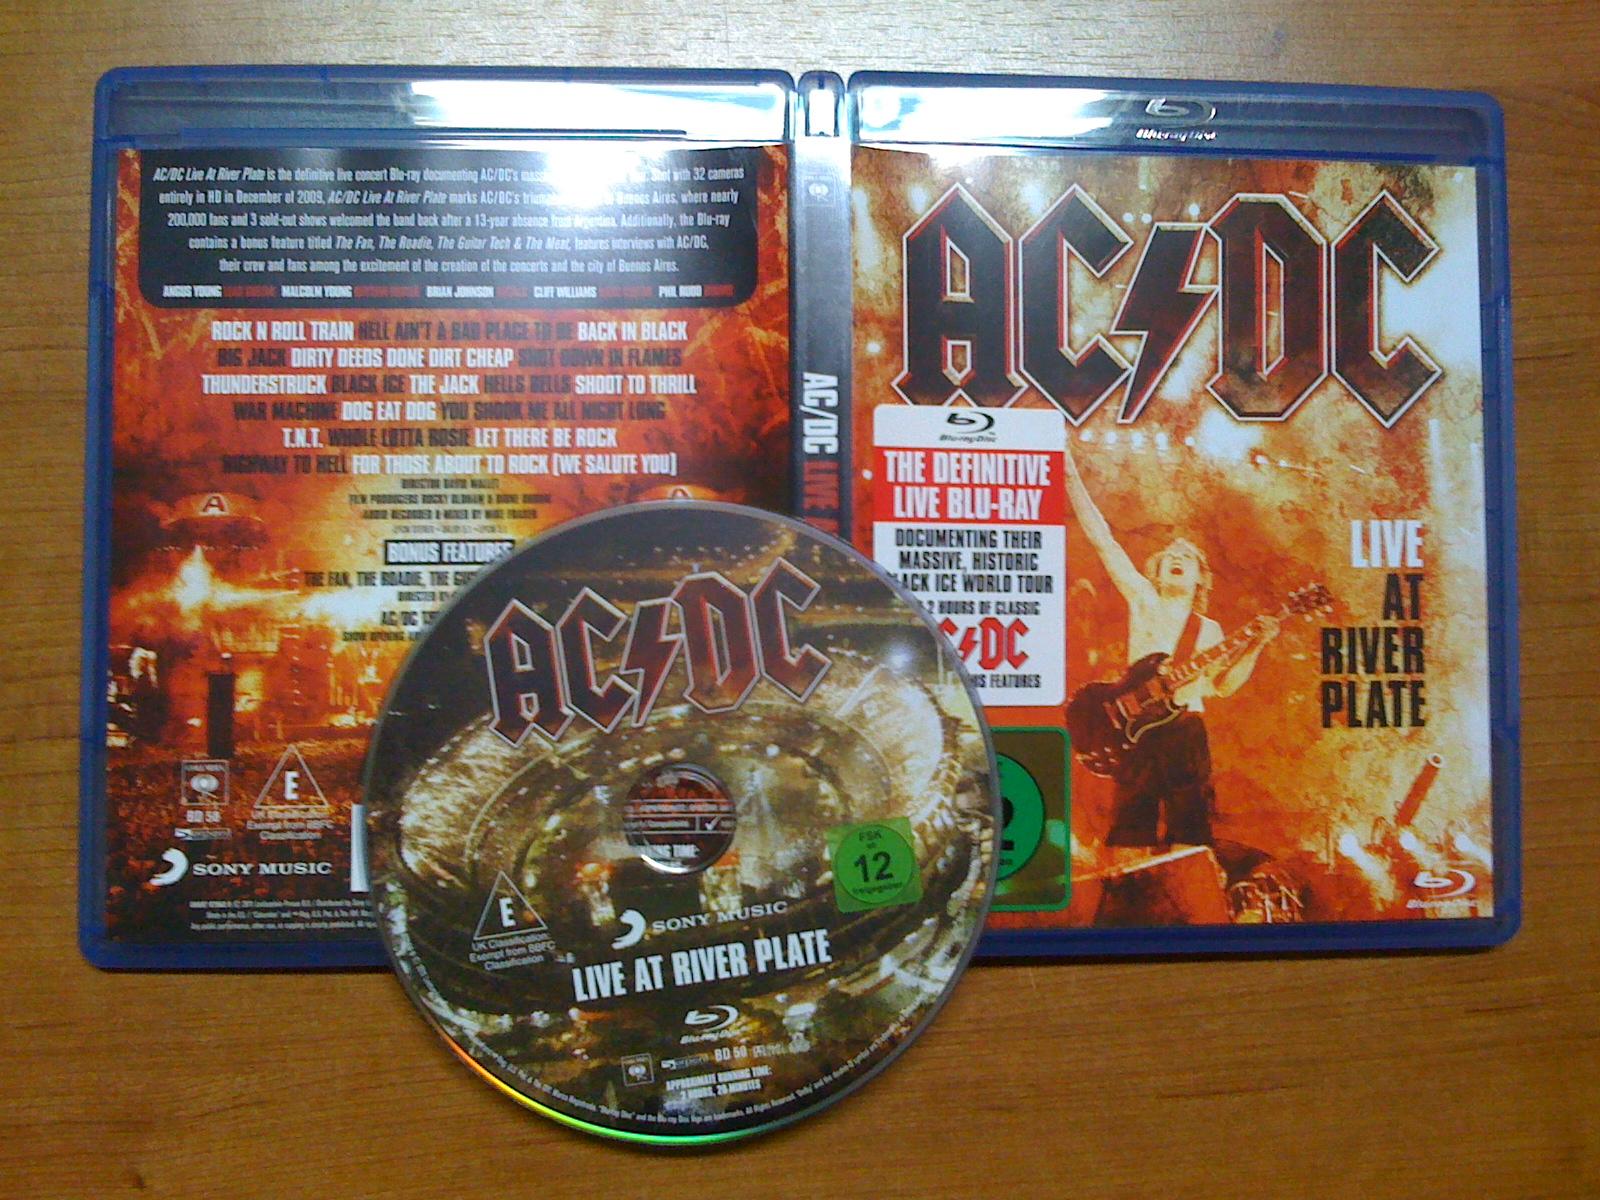 http://3.bp.blogspot.com/-CYgnxxZc2KI/TdHYemx5jAI/AAAAAAAACTY/PVD5rVglqiY/s1600/AC_DC-Live_At_River_Plate-%252888697_87060_9%2529-BD-2011-211.jpg